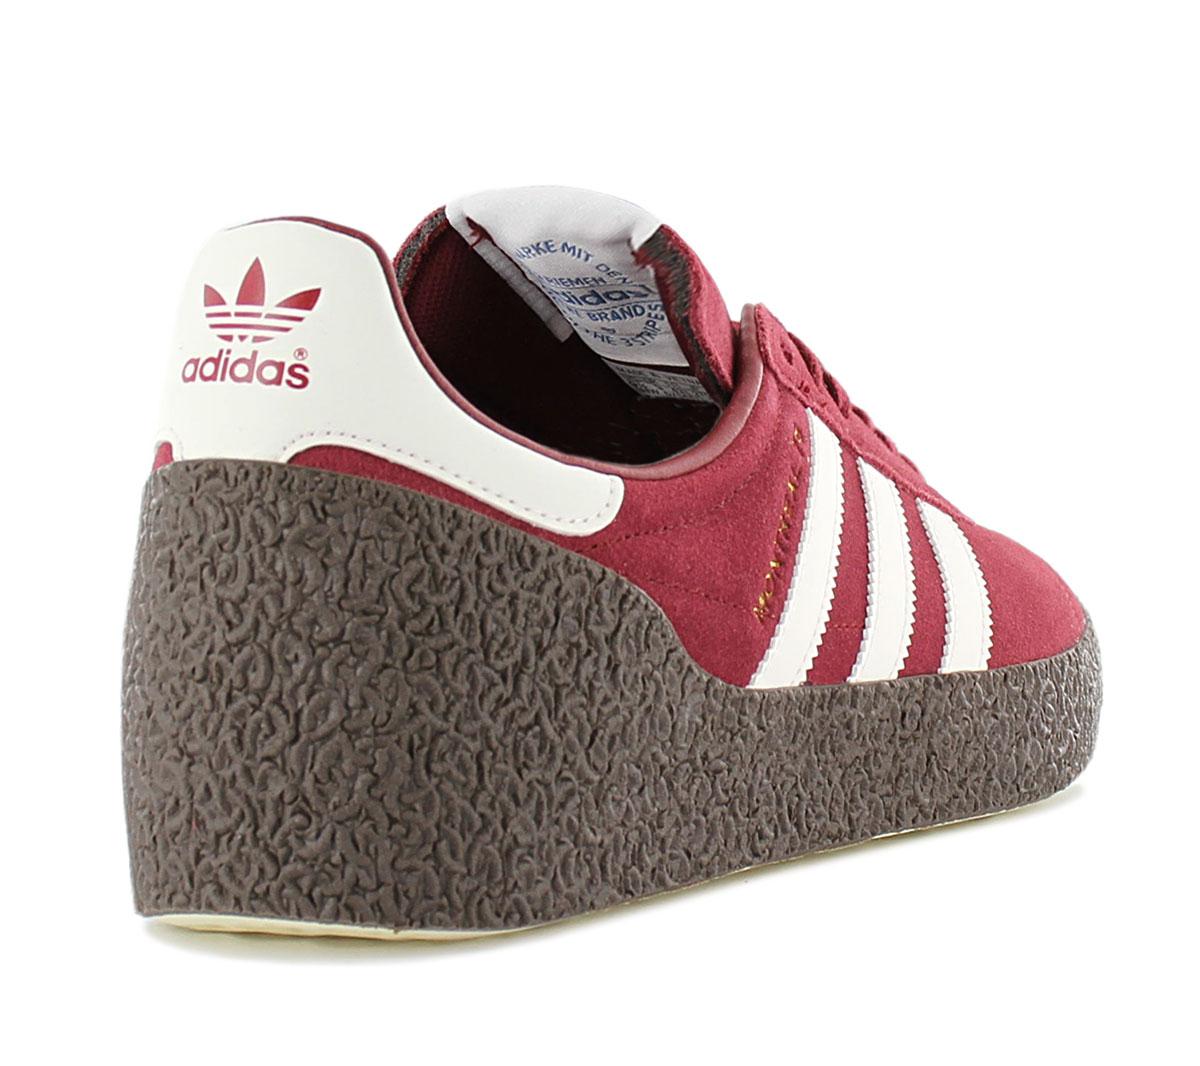 Details zu adidas Originals Montreal 76 Herren Schuhe AQ1016 Retro Turnschuhe Sportschuhe